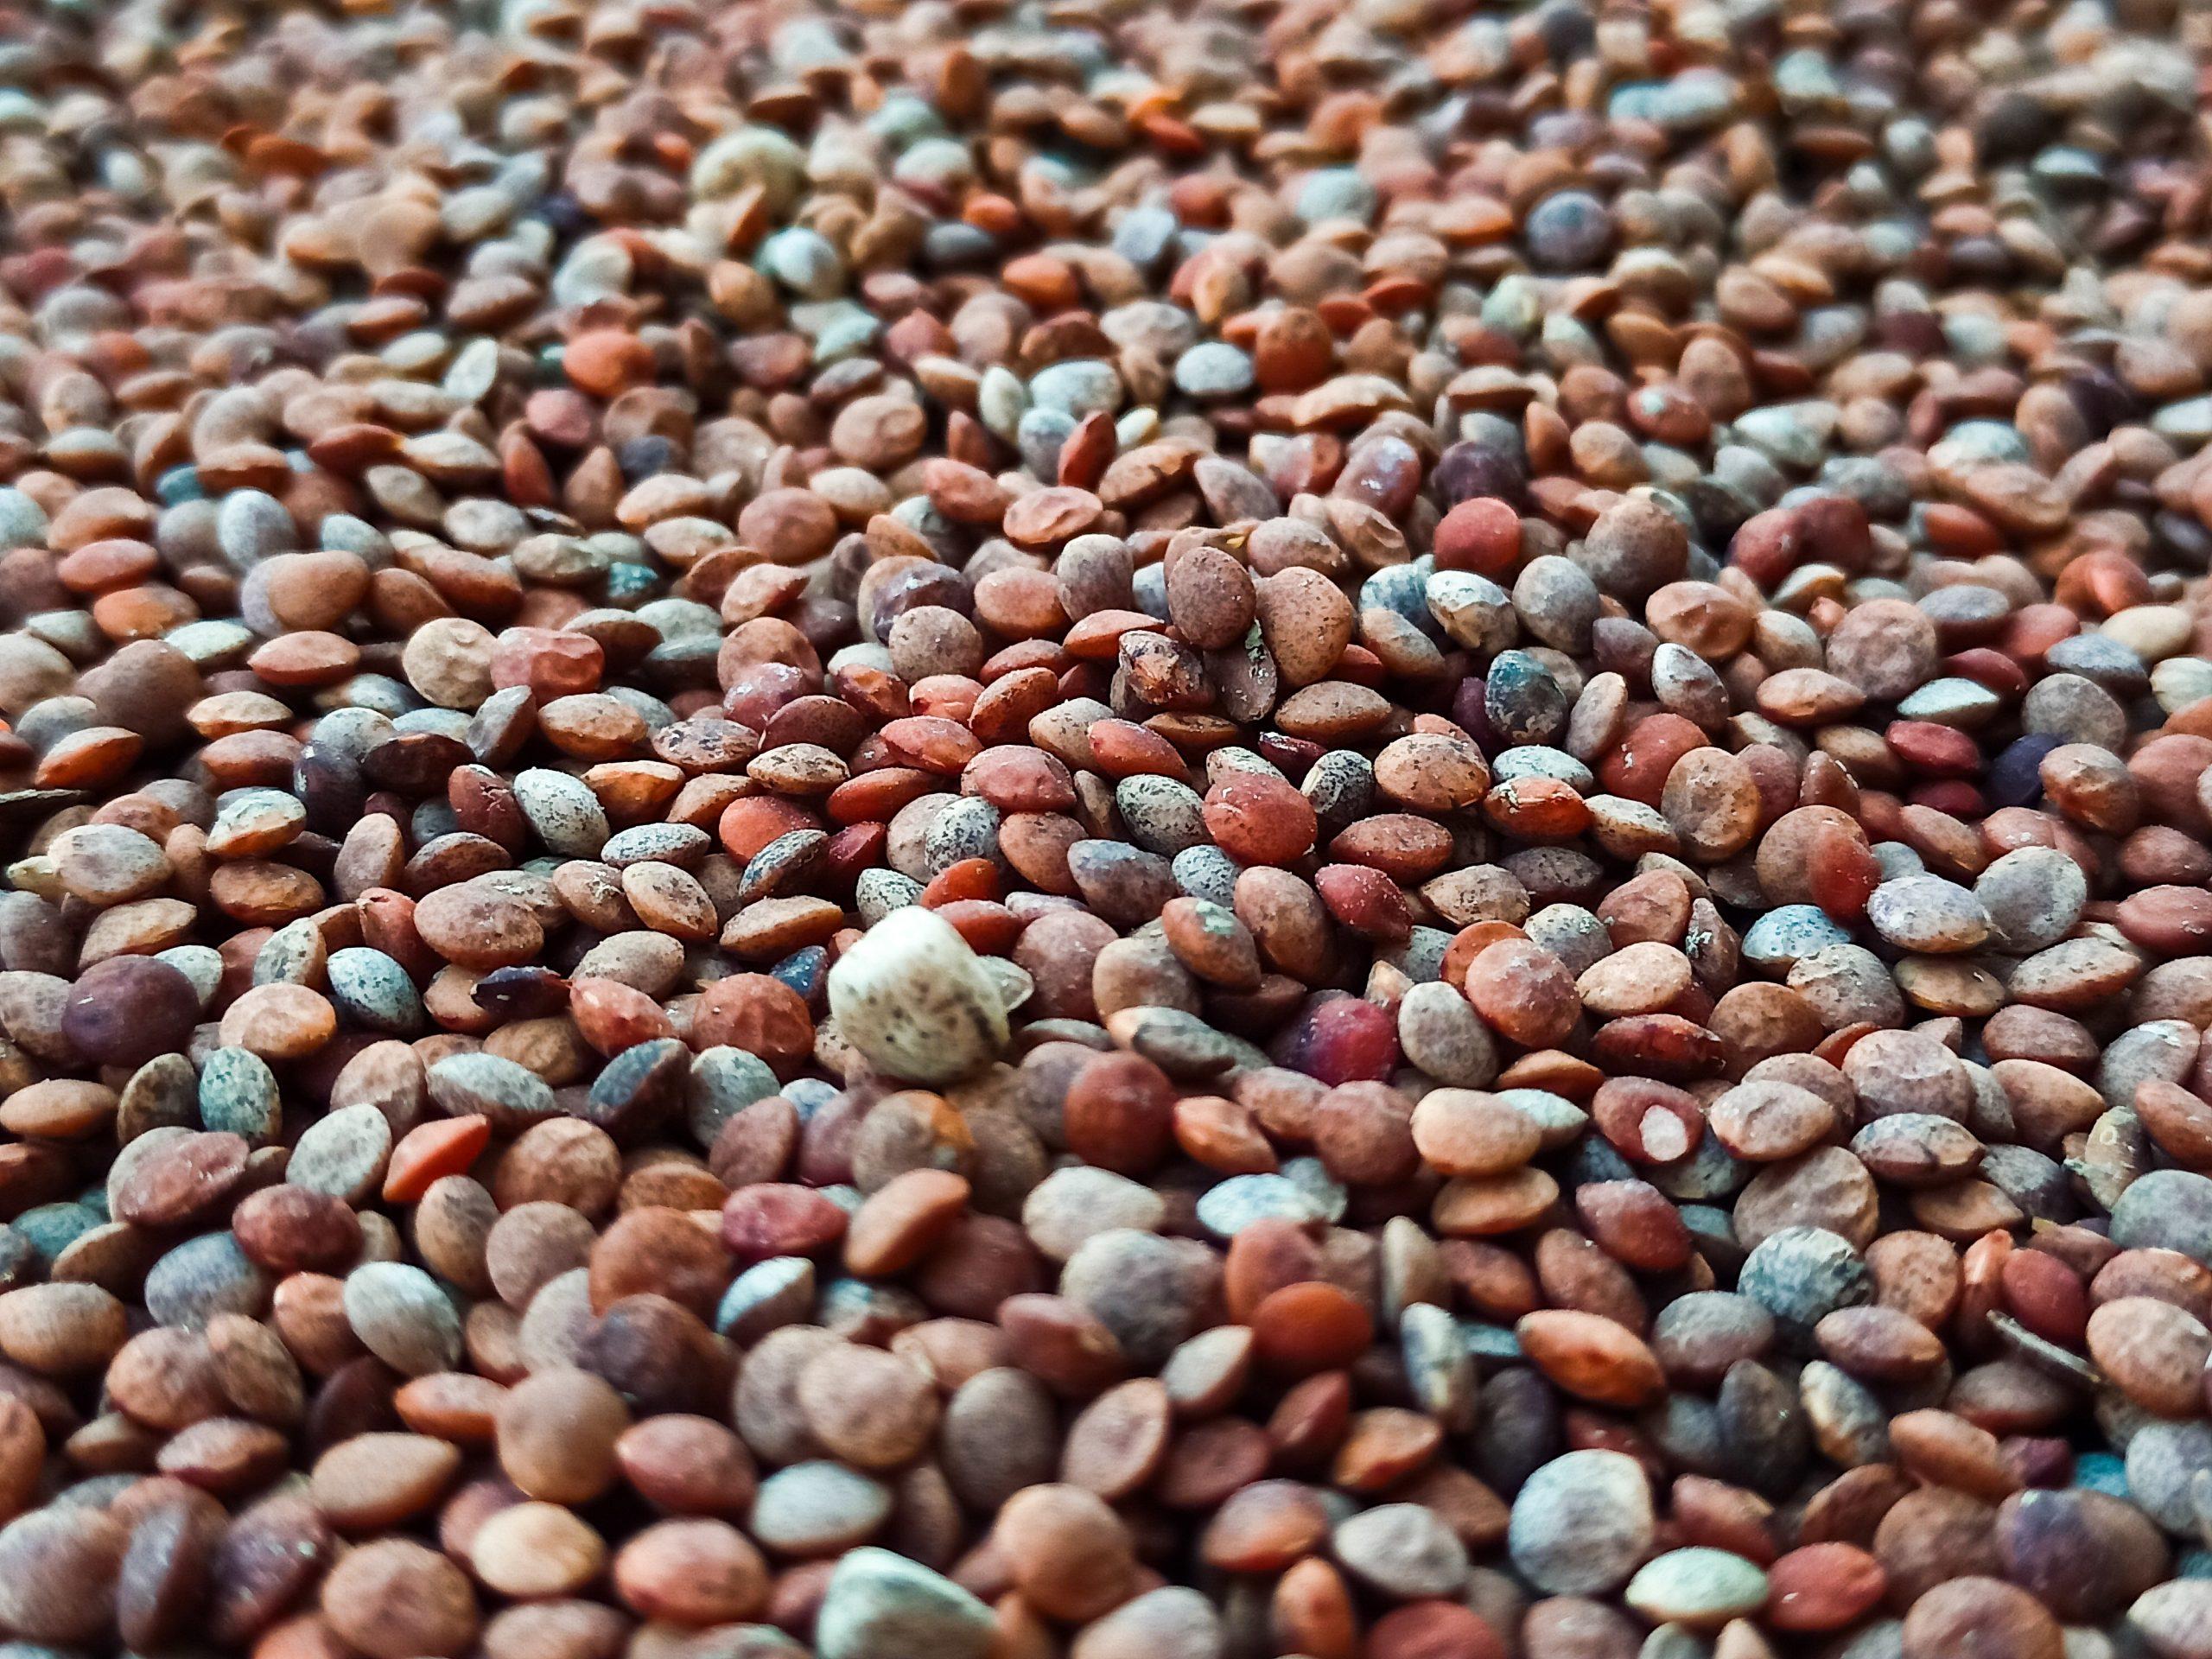 Pulse grains